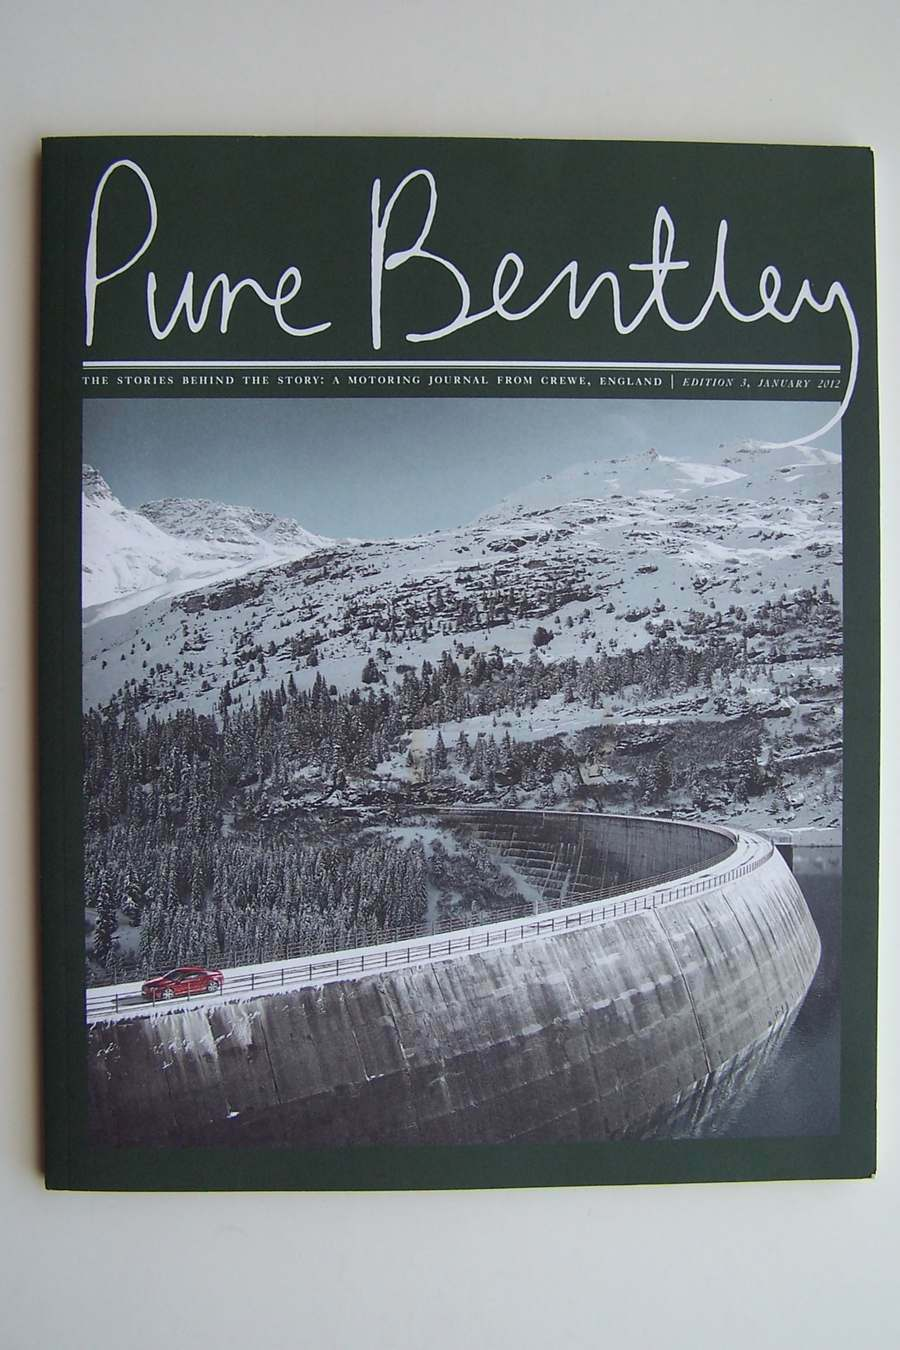 Pure Bentley Motoring Journal from Crewe England: The S